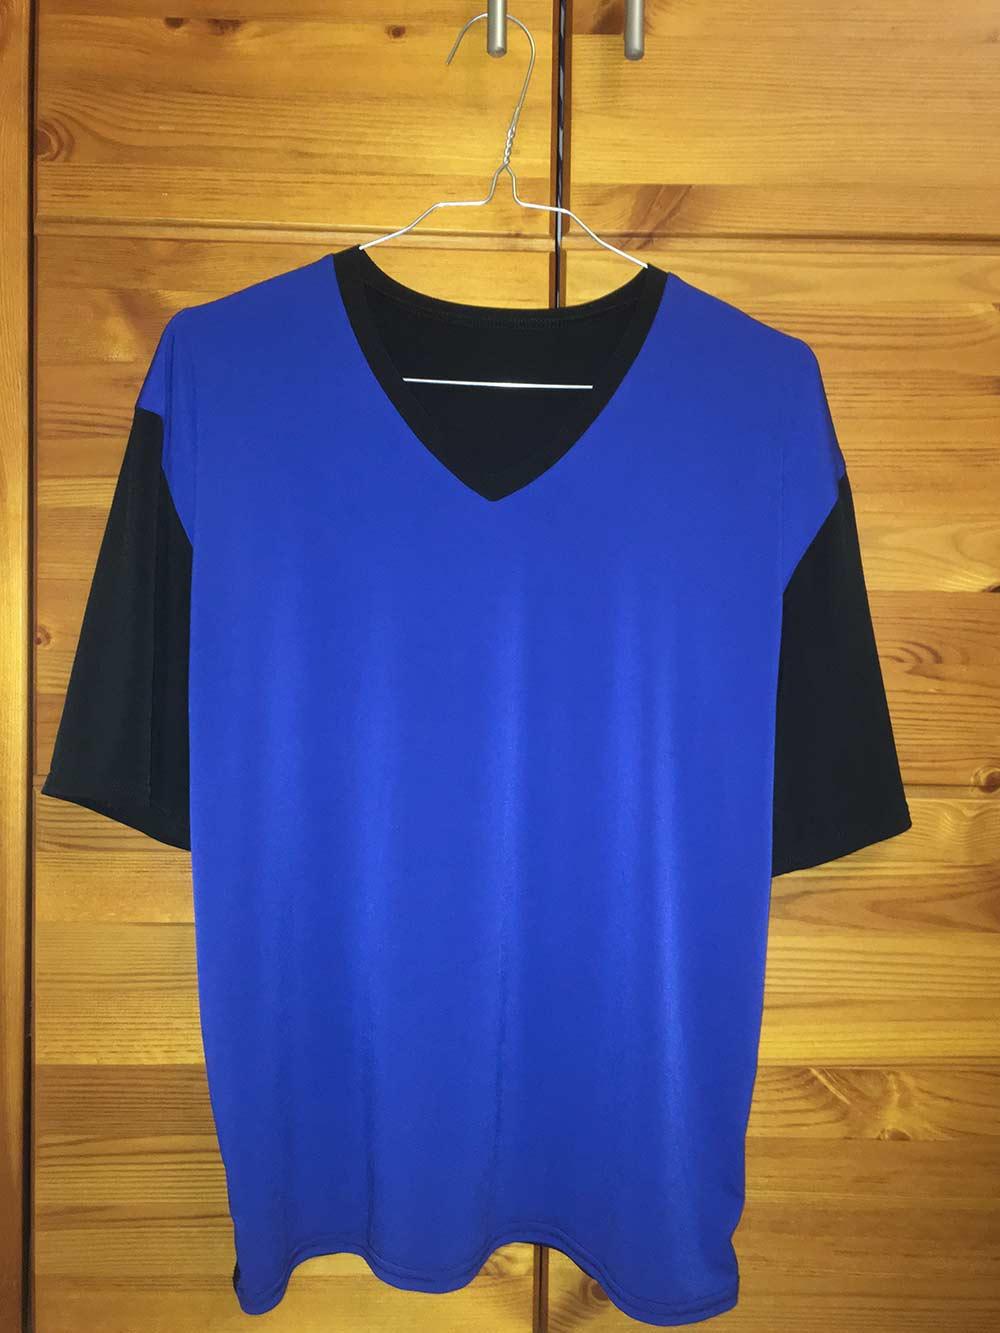 Моя танцевальная футболка за 1200<span class=ruble>Р</span>